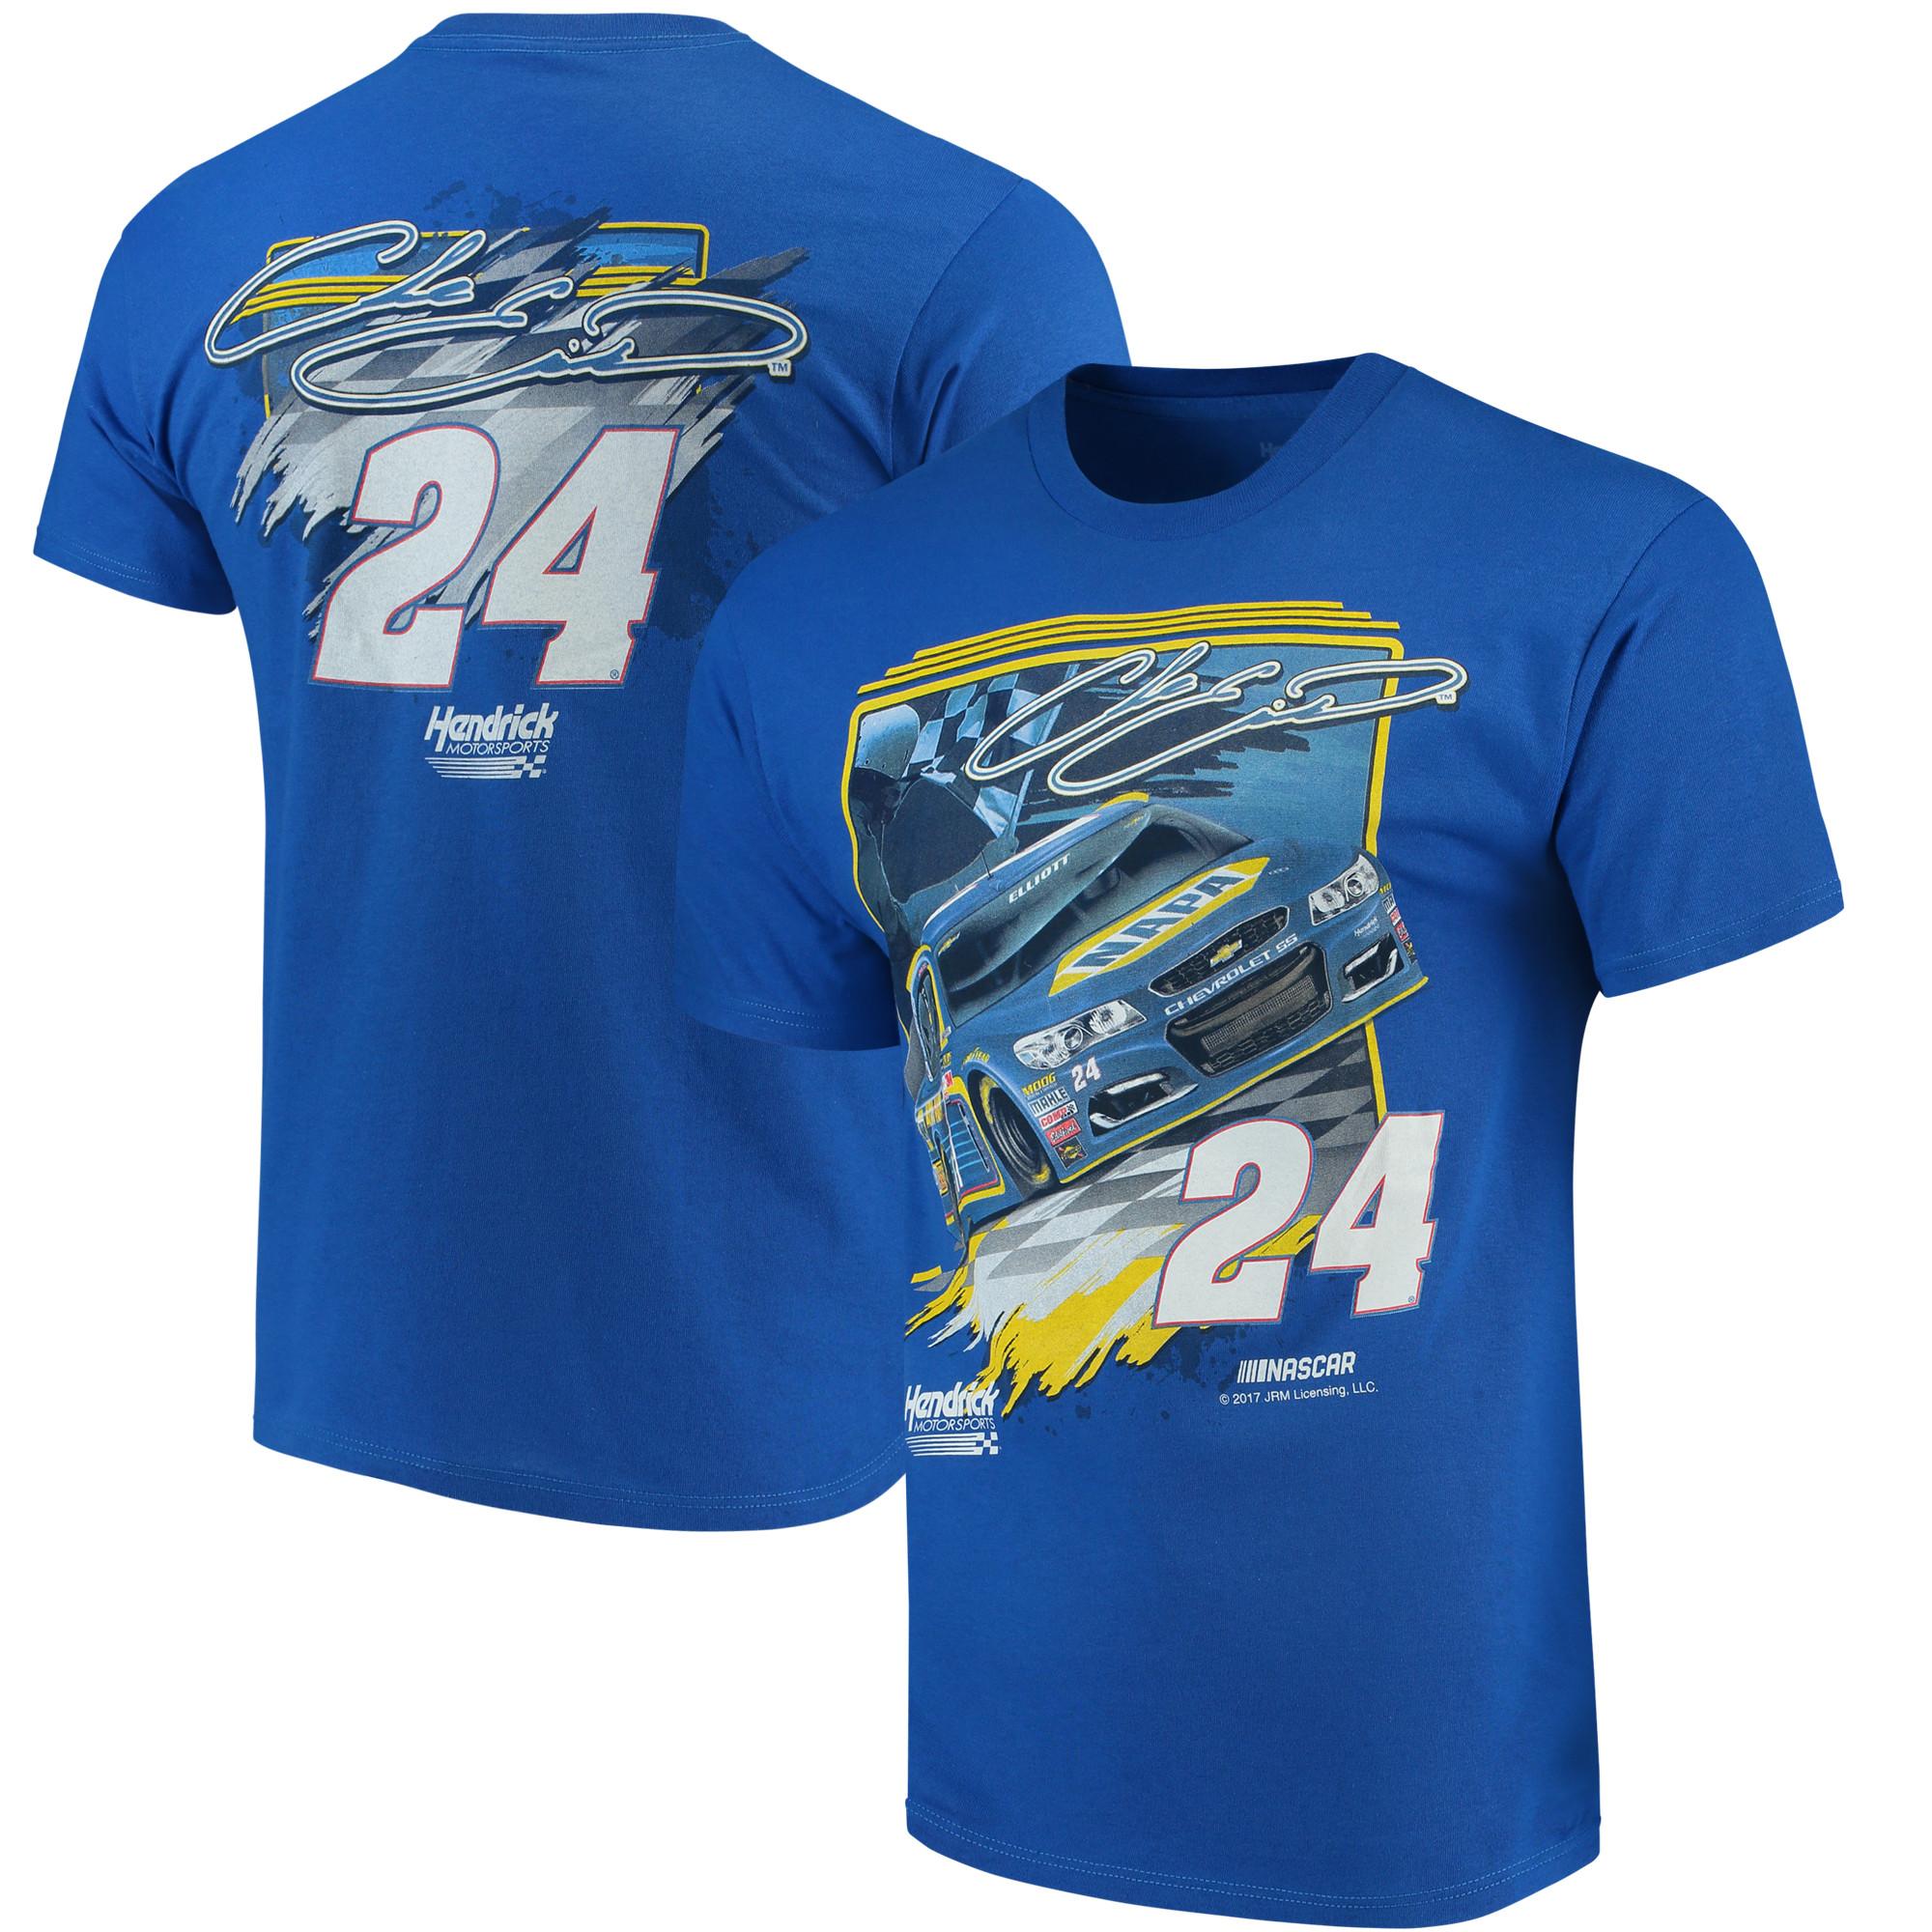 Chase Elliott NAPA Victory Lane T-Shirt - Royal